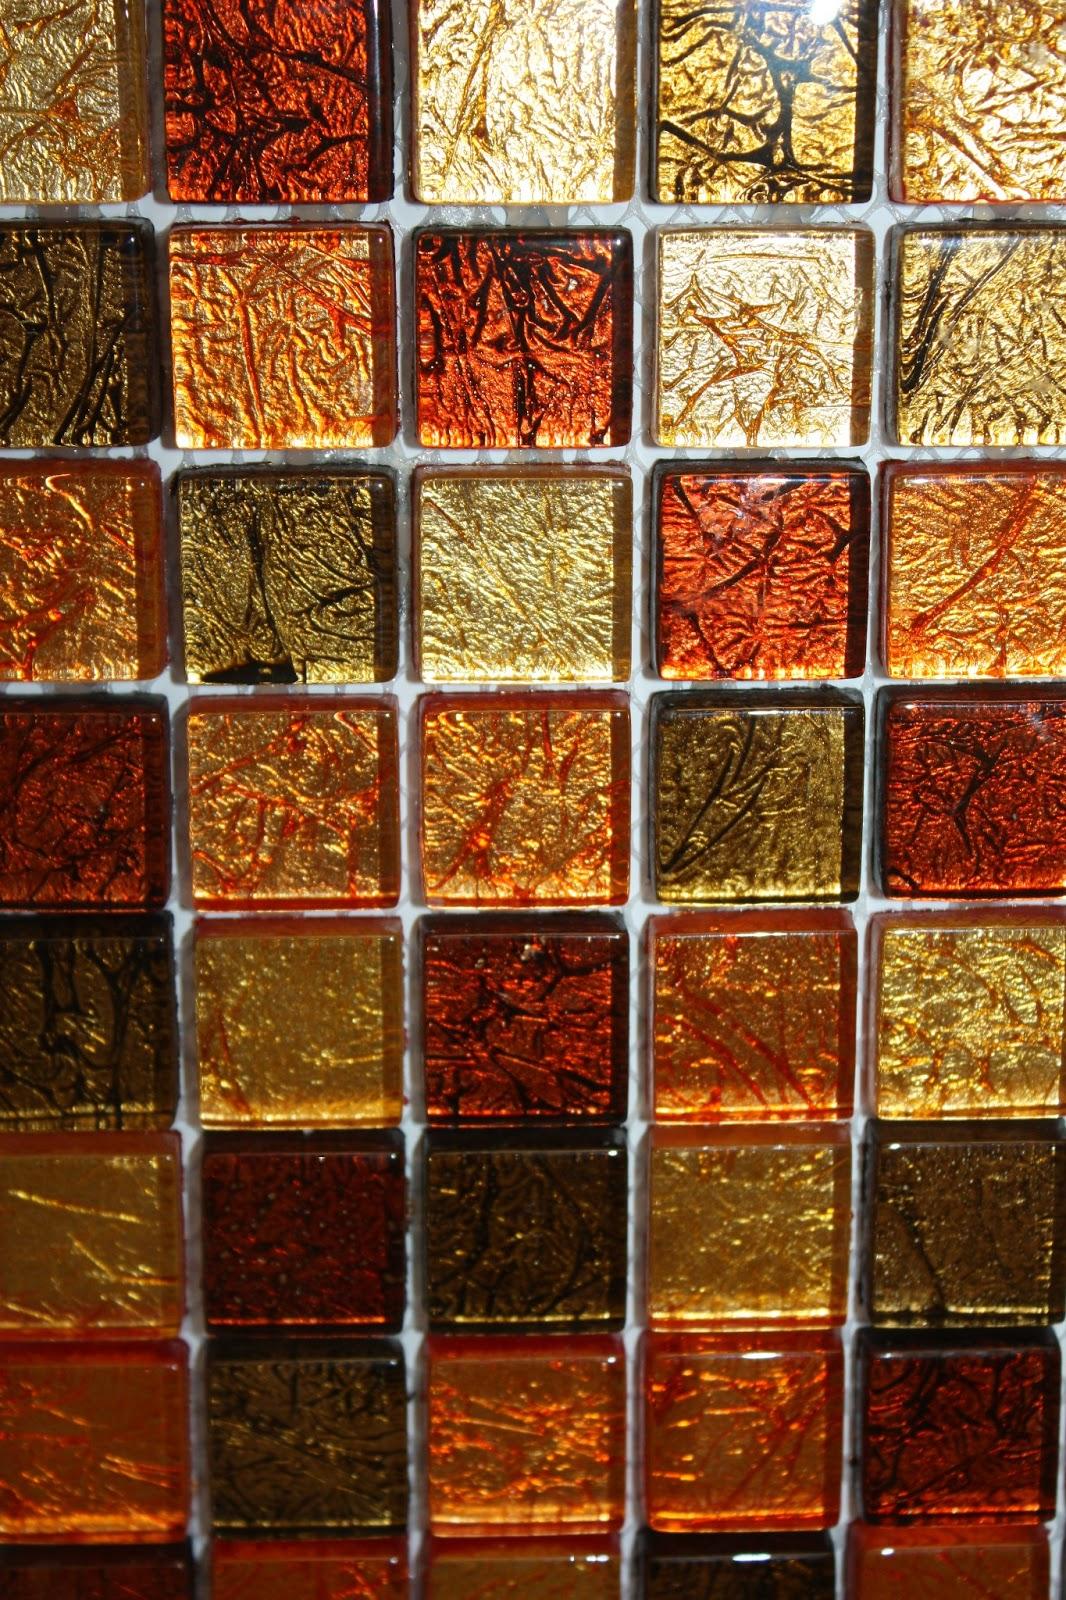 Colorama stockholmsvägen mariestad: mosaik